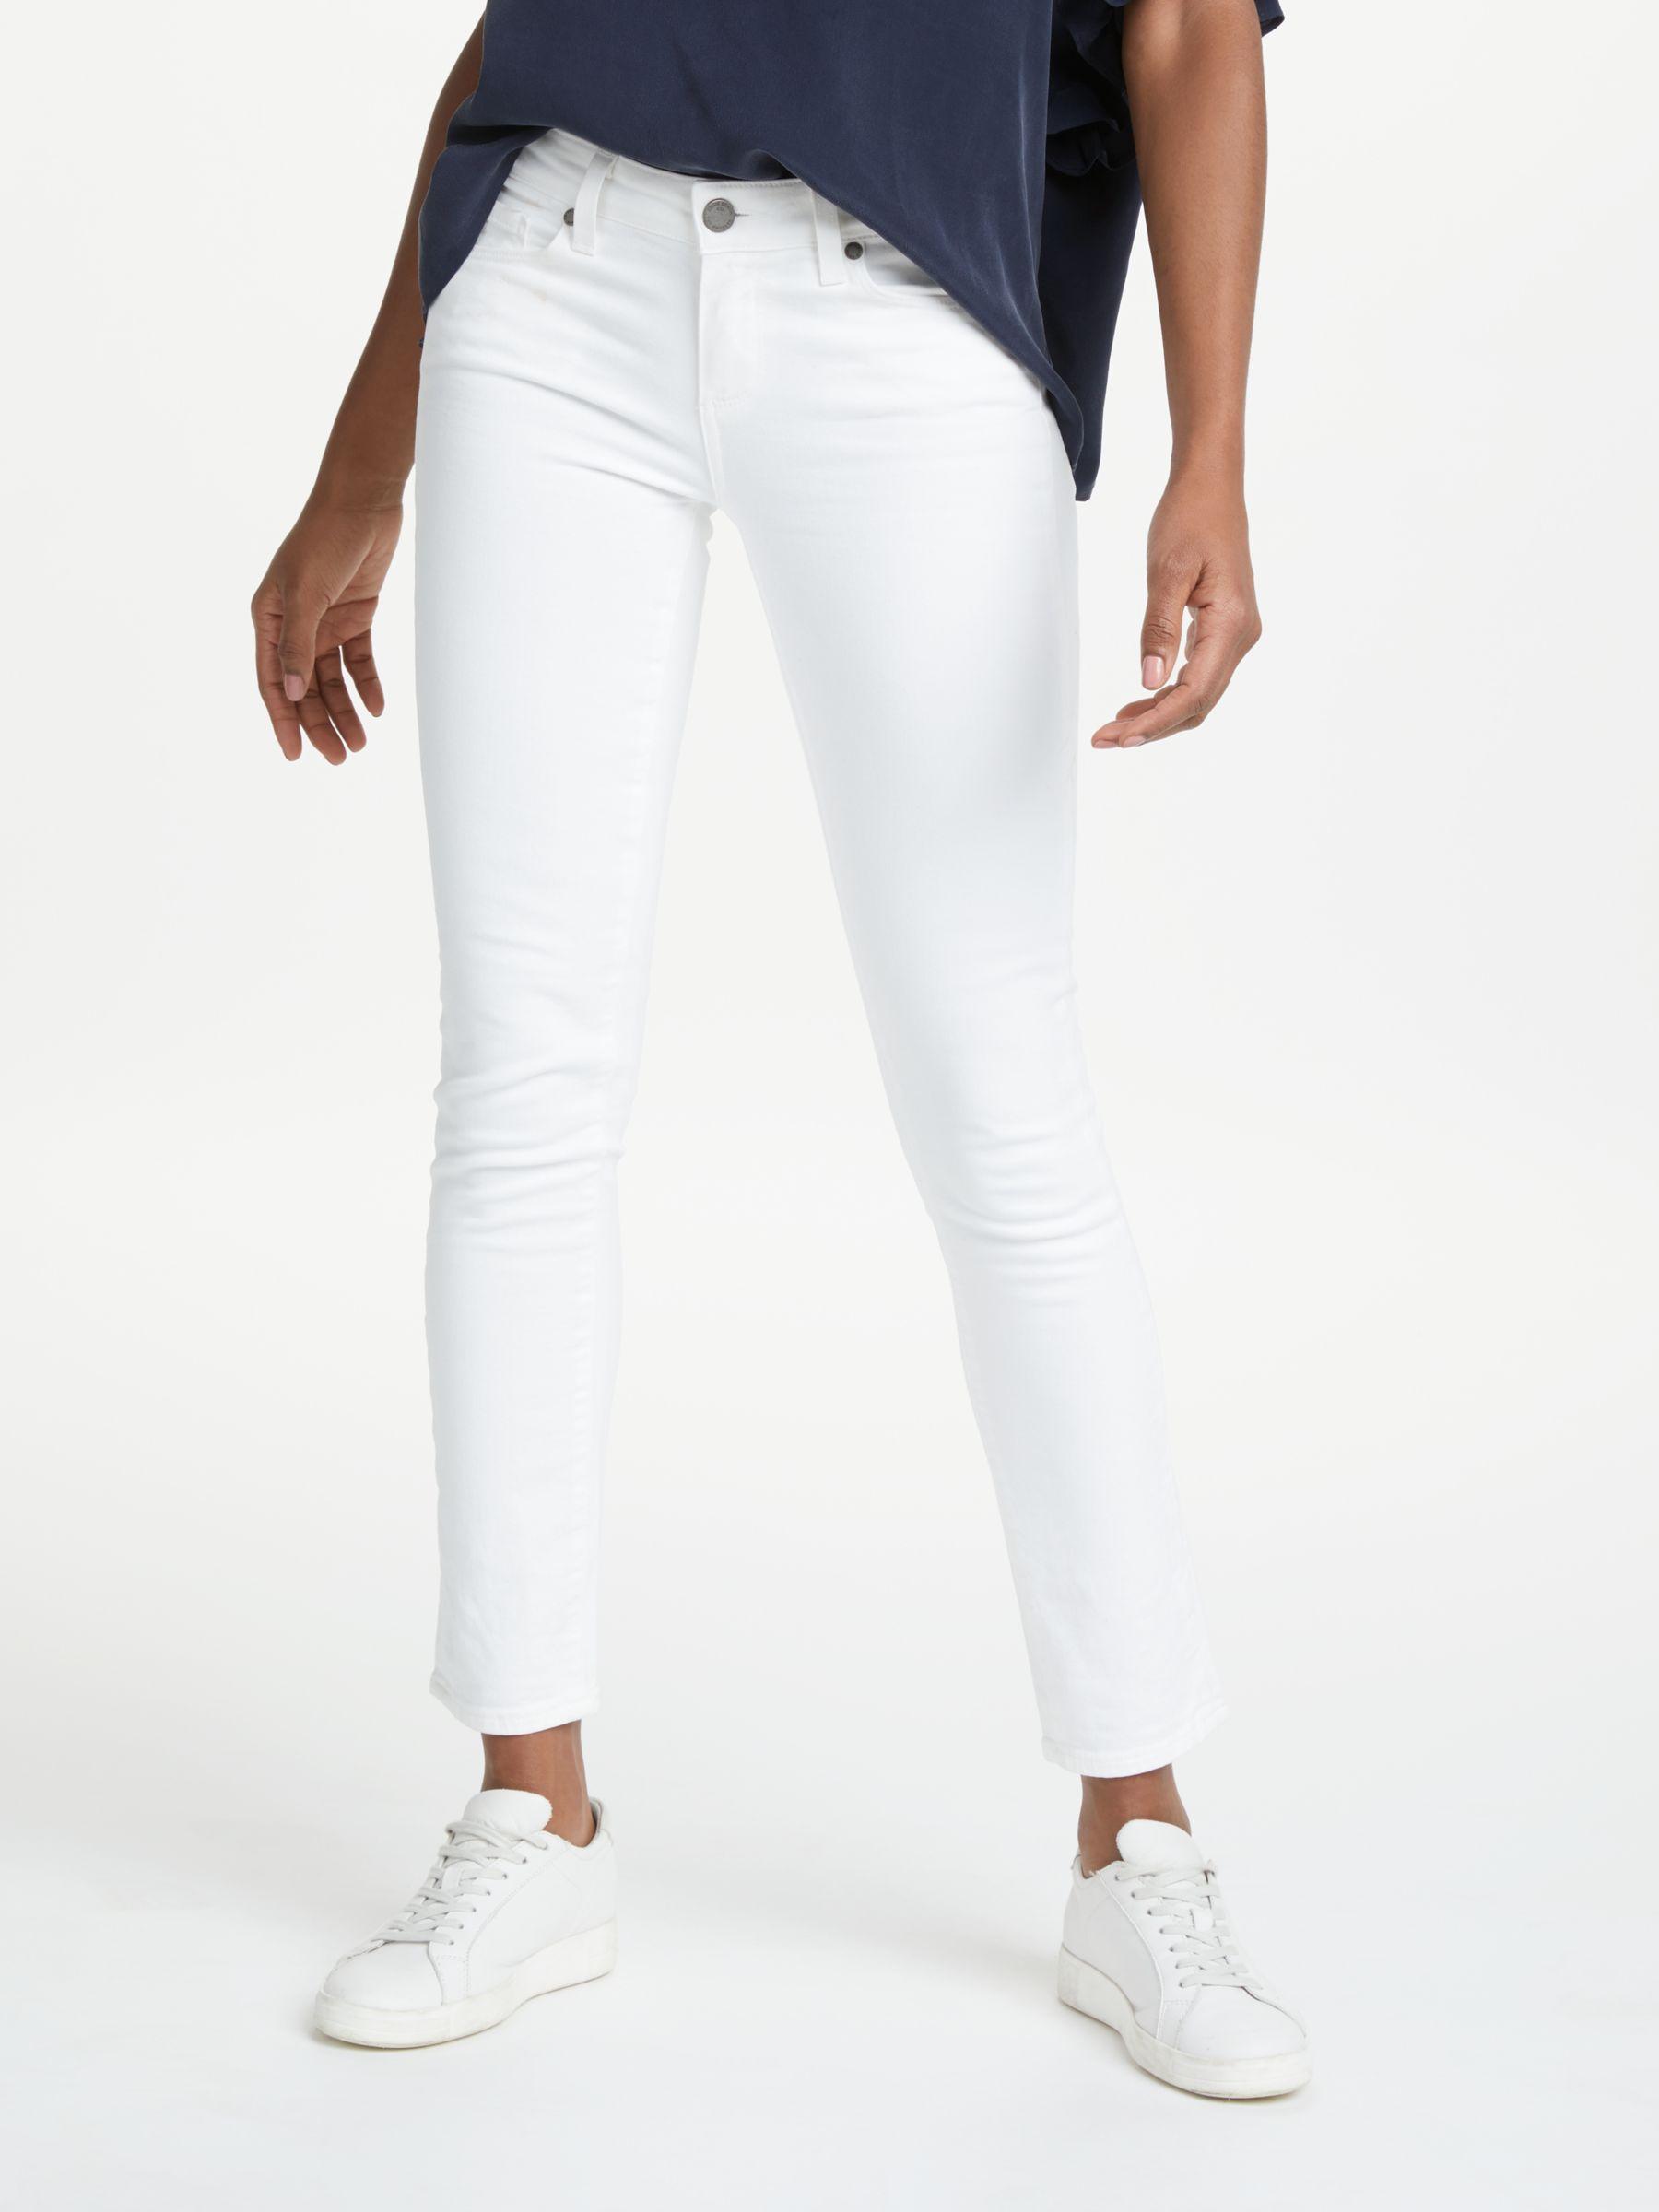 Paige Paige Skyline Skinny Jeans, Optic White